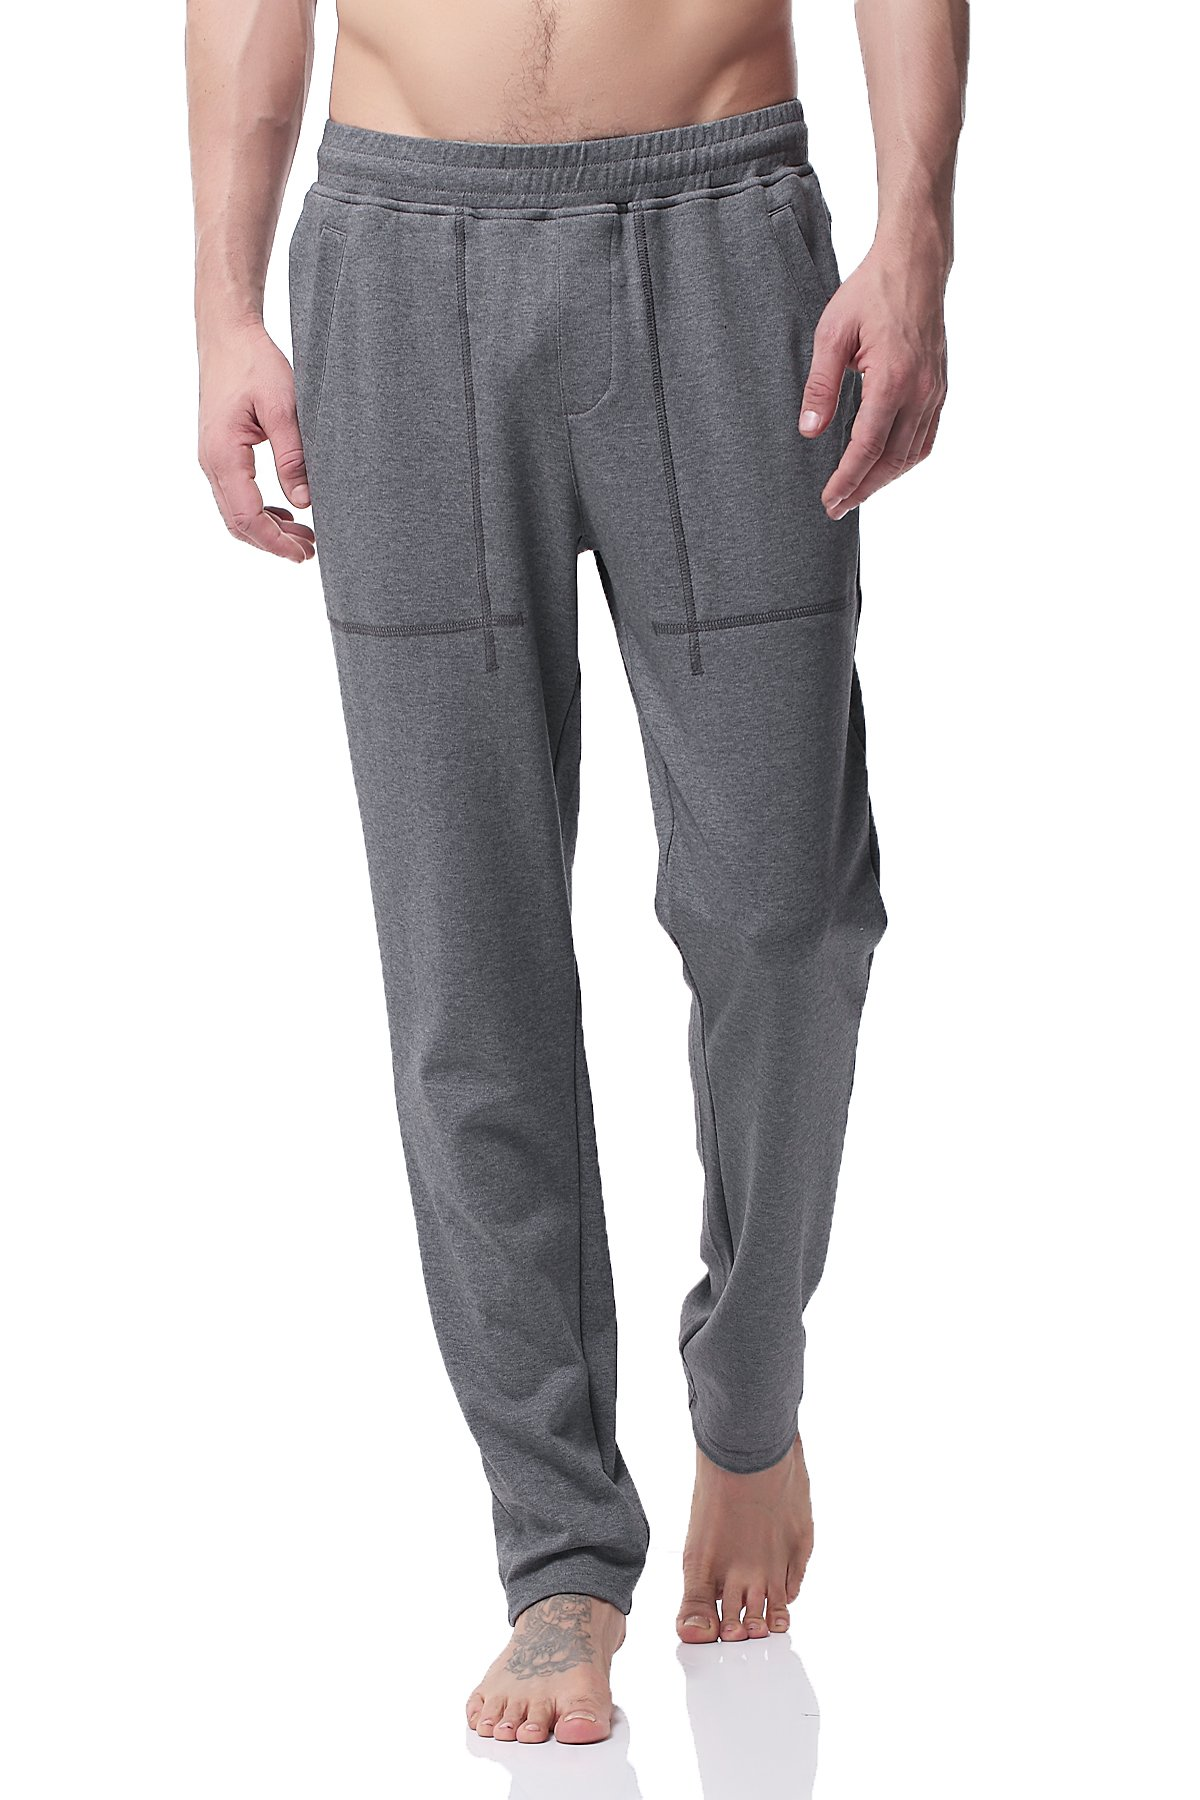 Pau1Hami1ton Men's Stretch Cotton Sweatpants Gym Running Training Track Yoga Pants PH-20